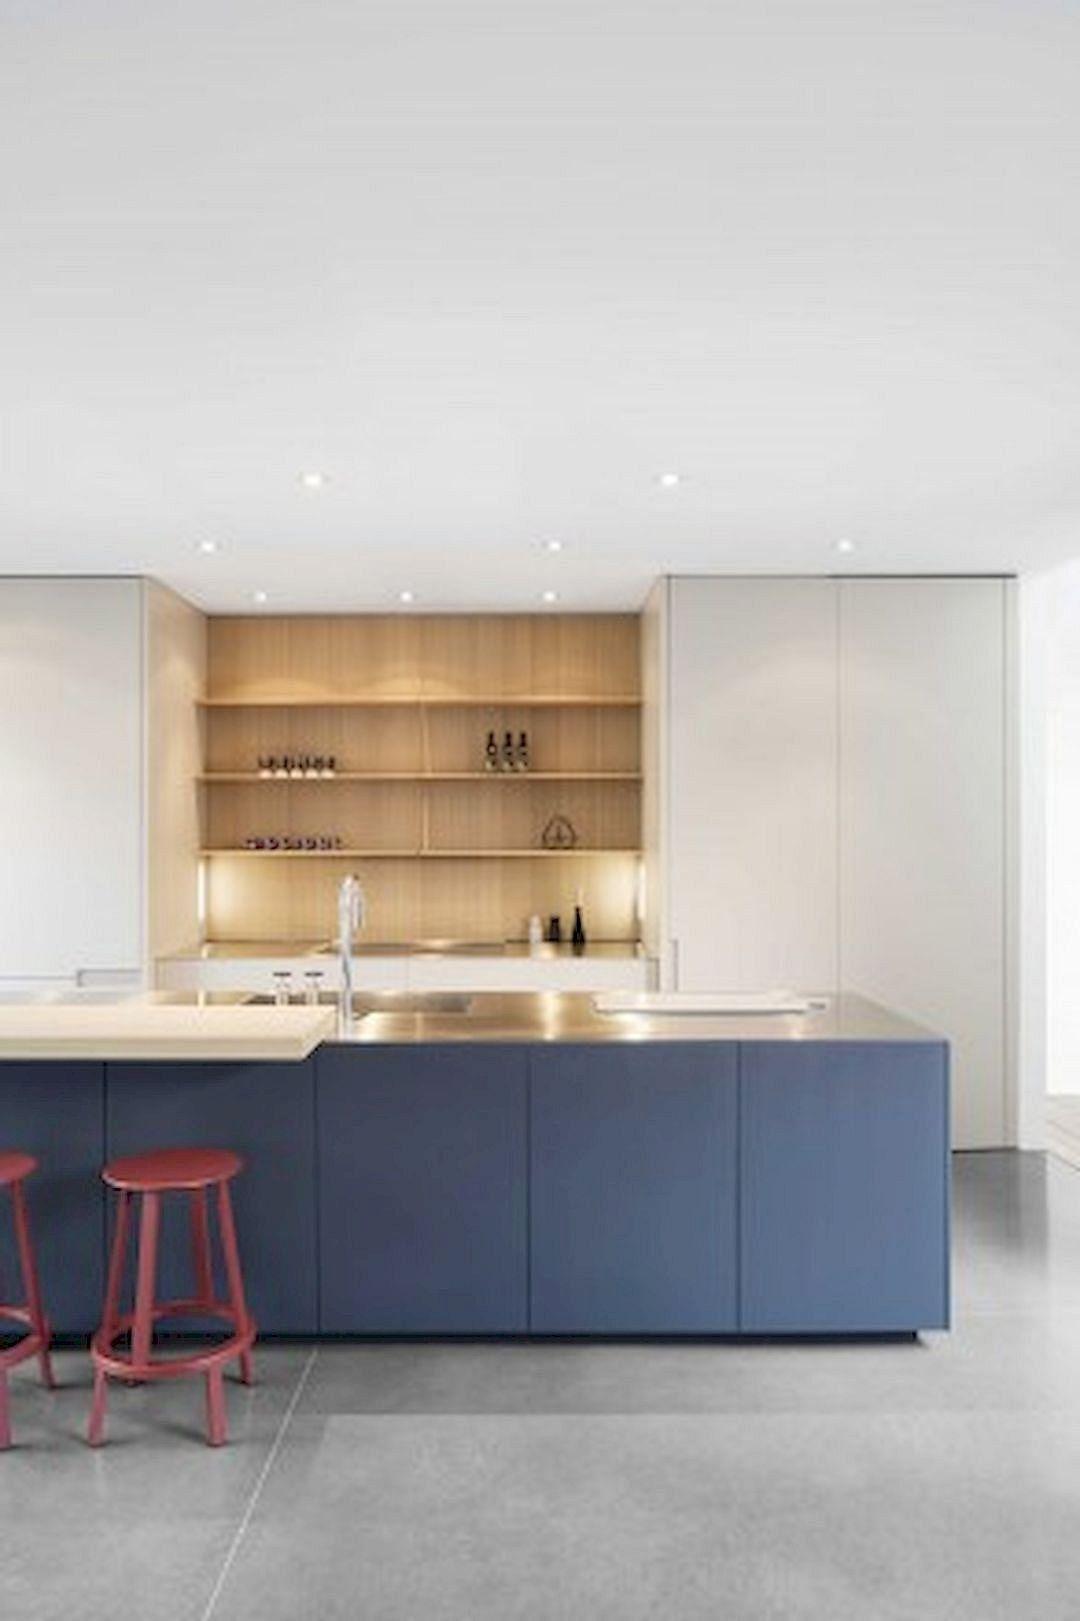 Superieur Perfectly Designed Modern Kitchen Inspirations (165 Photos)  Https://www.futuristarchitecture.com/22124 Modern Kitchen Designs.html